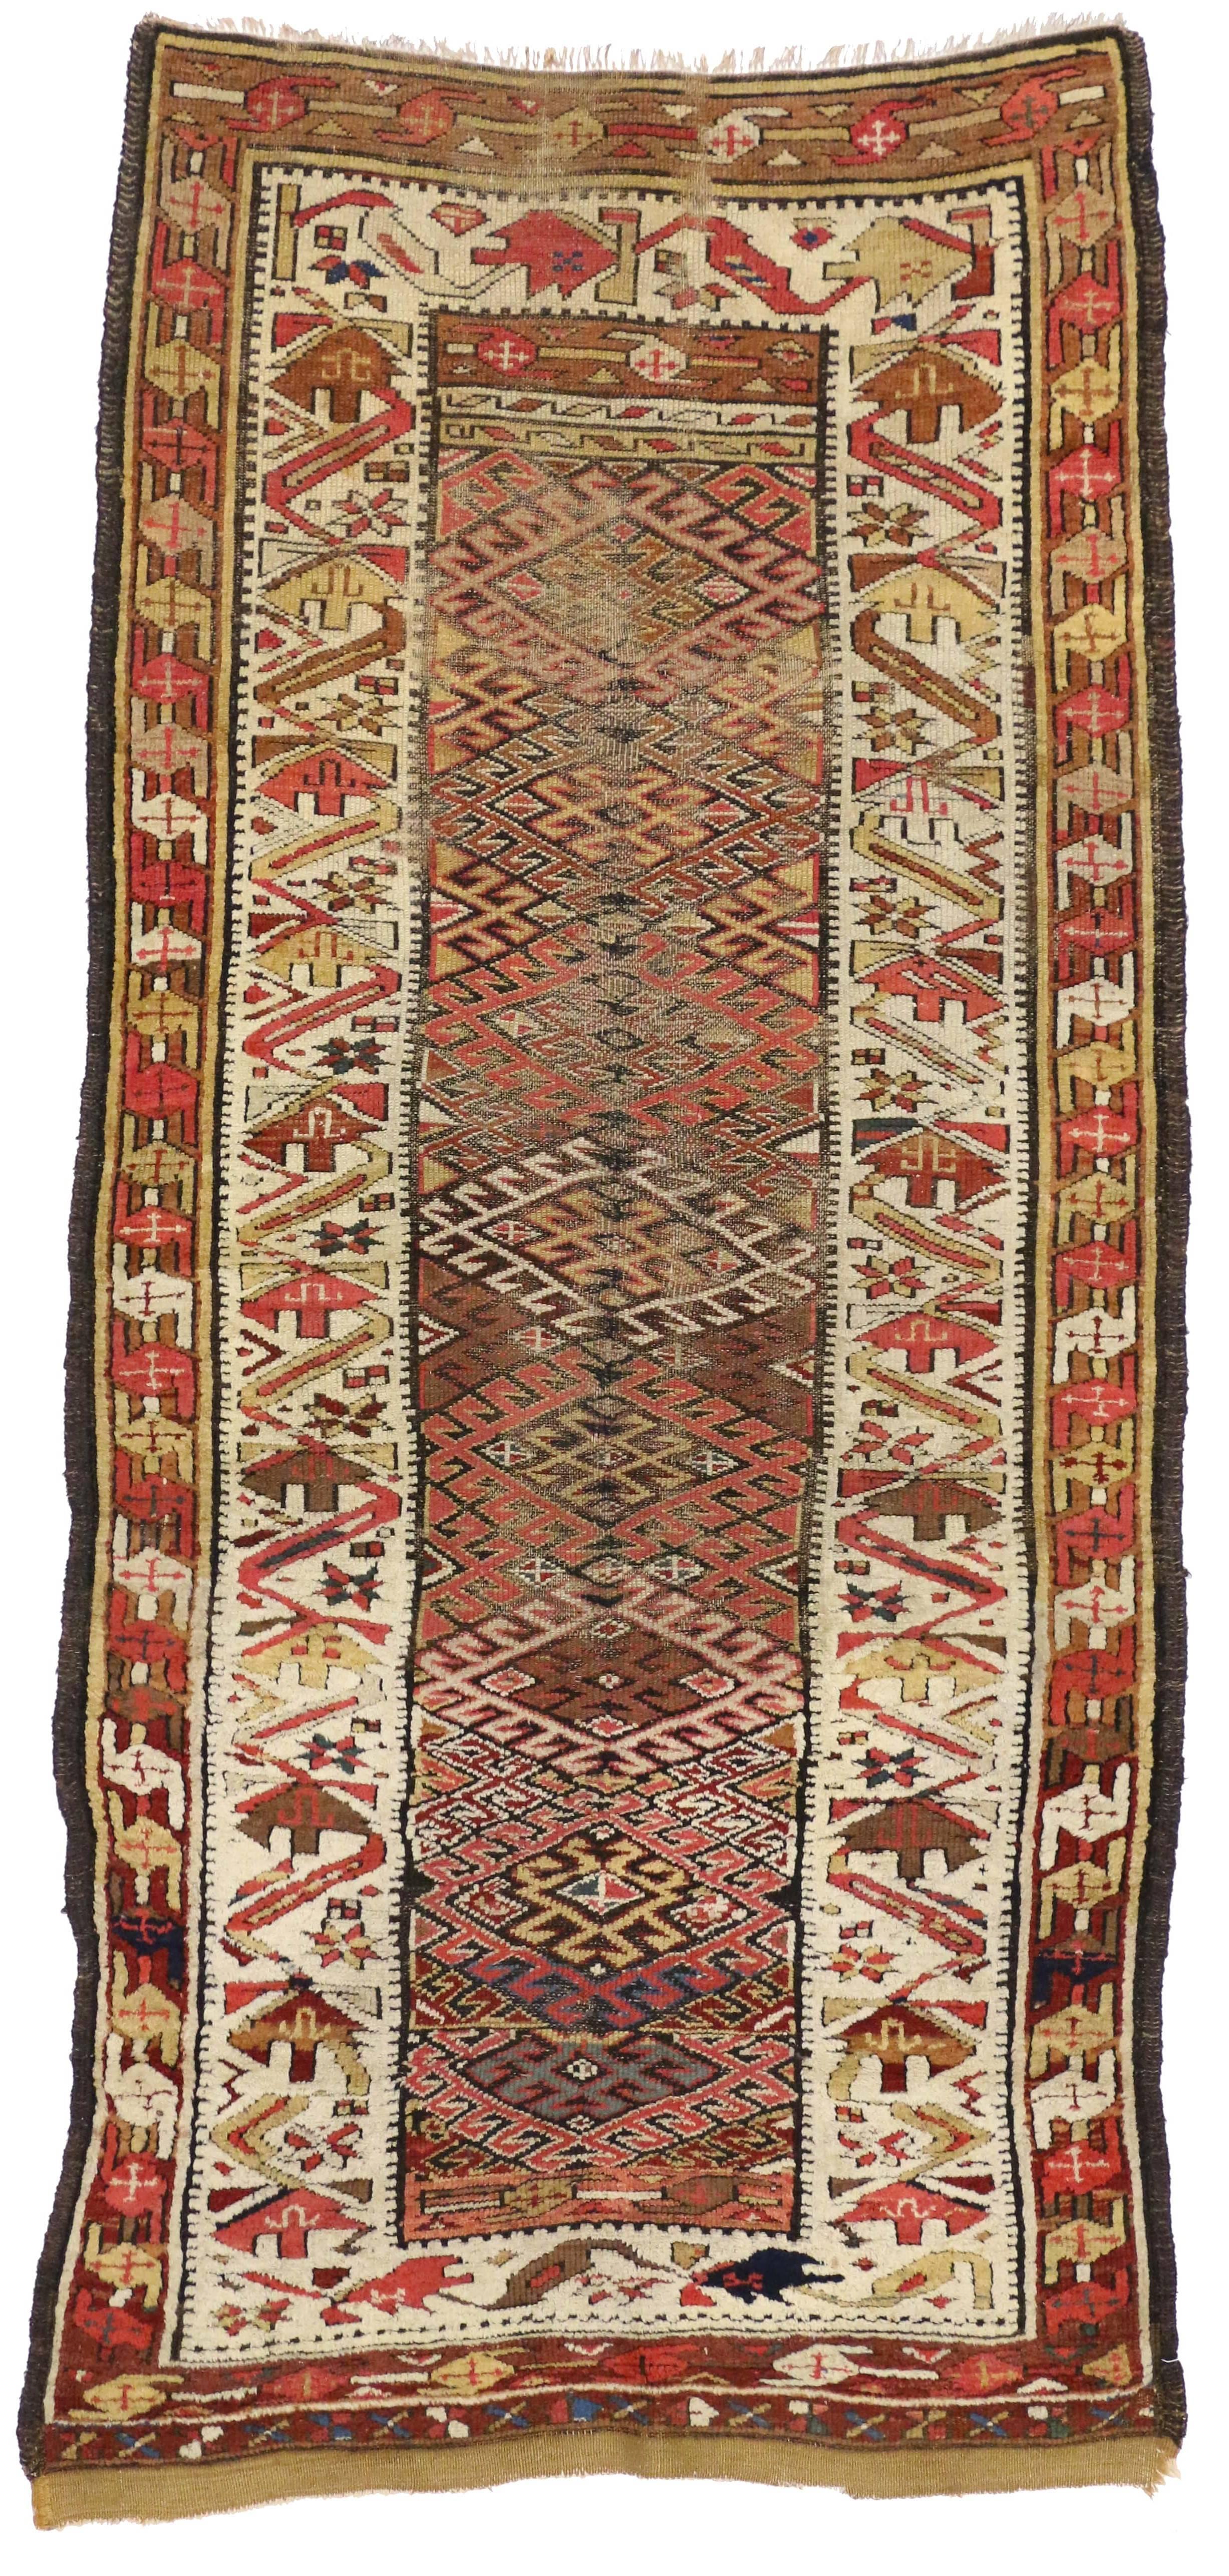 Antique Persian Kurdish Tribal Runner Hallway Runner